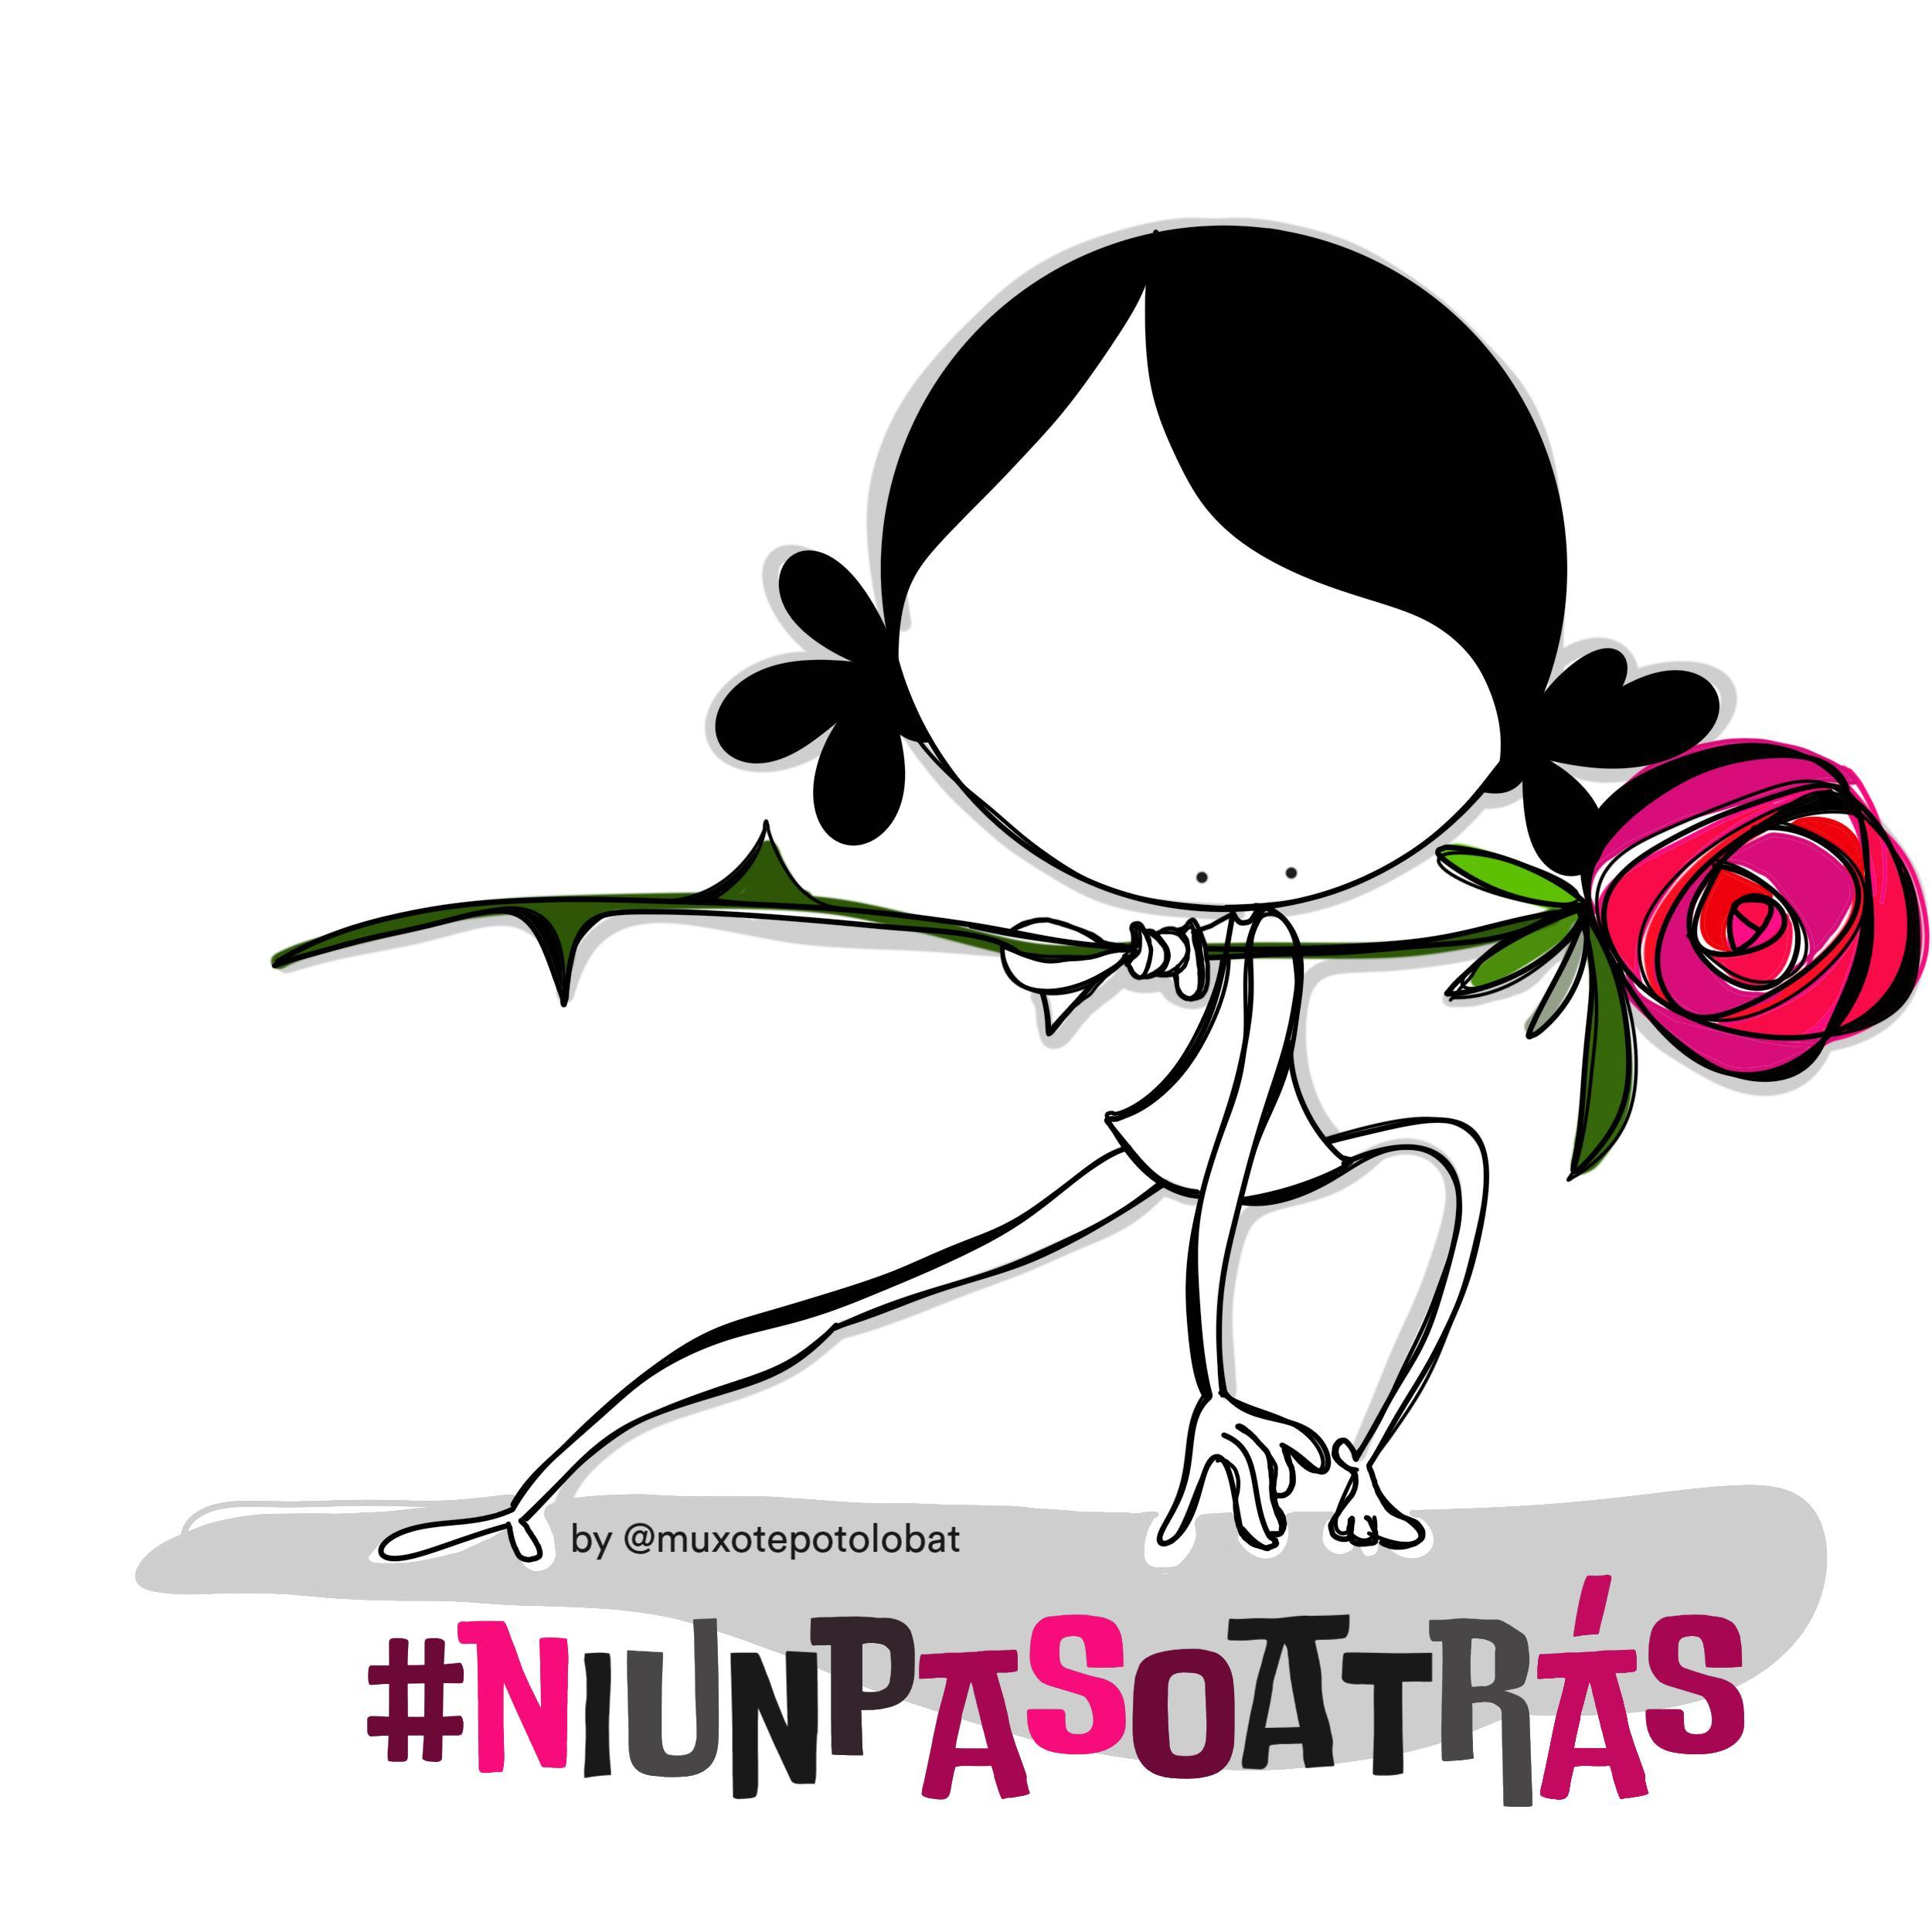 #niunpasoatrás